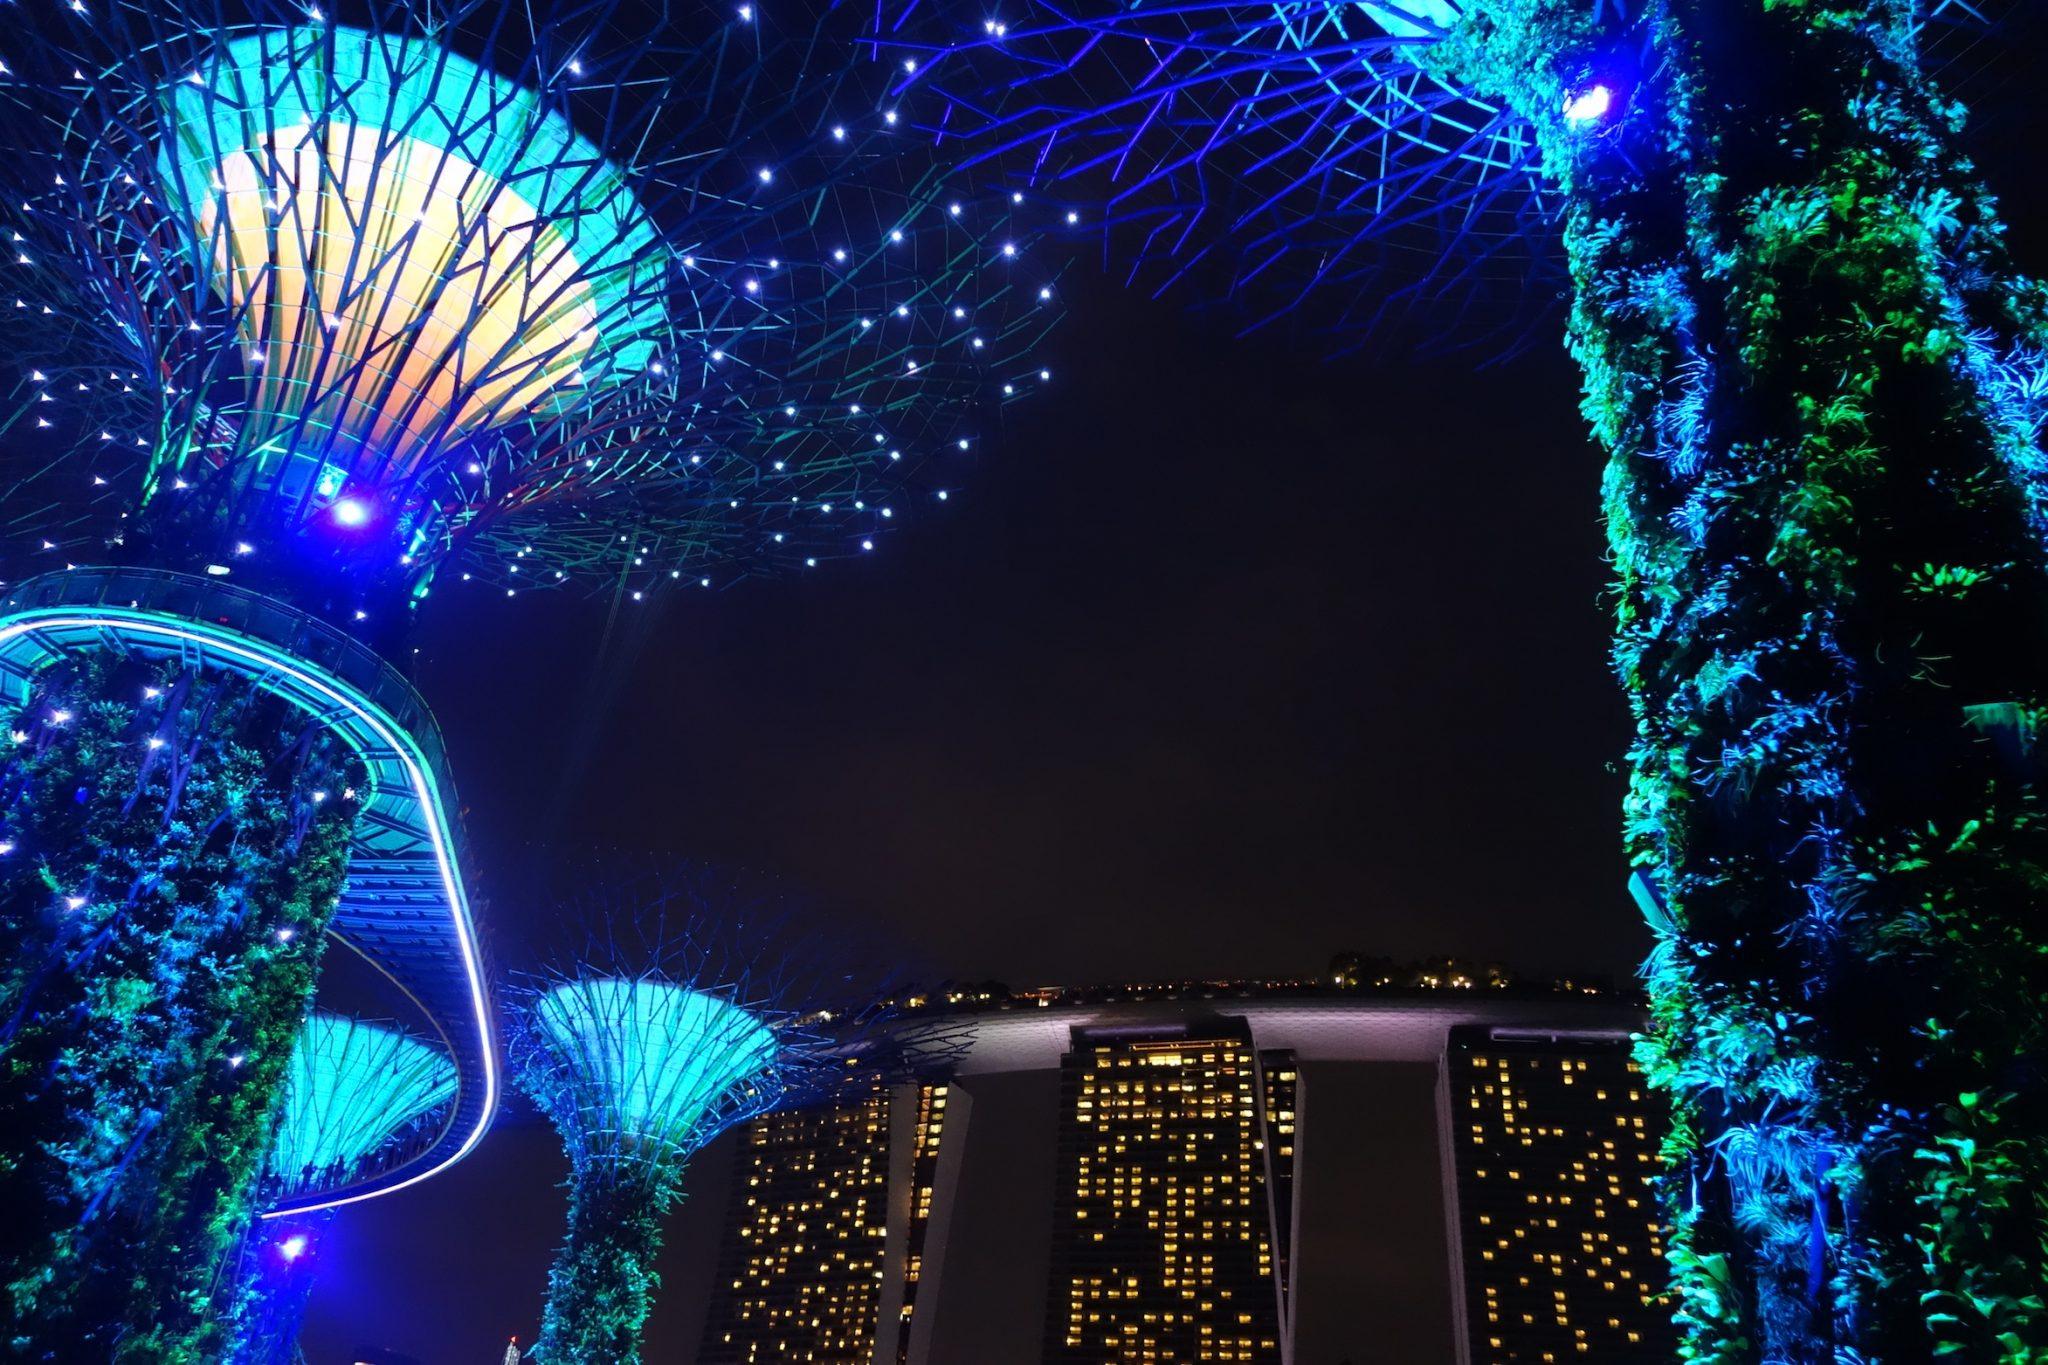 Singapur_GardensbytheBay_SkyTrees_beiNacht_5